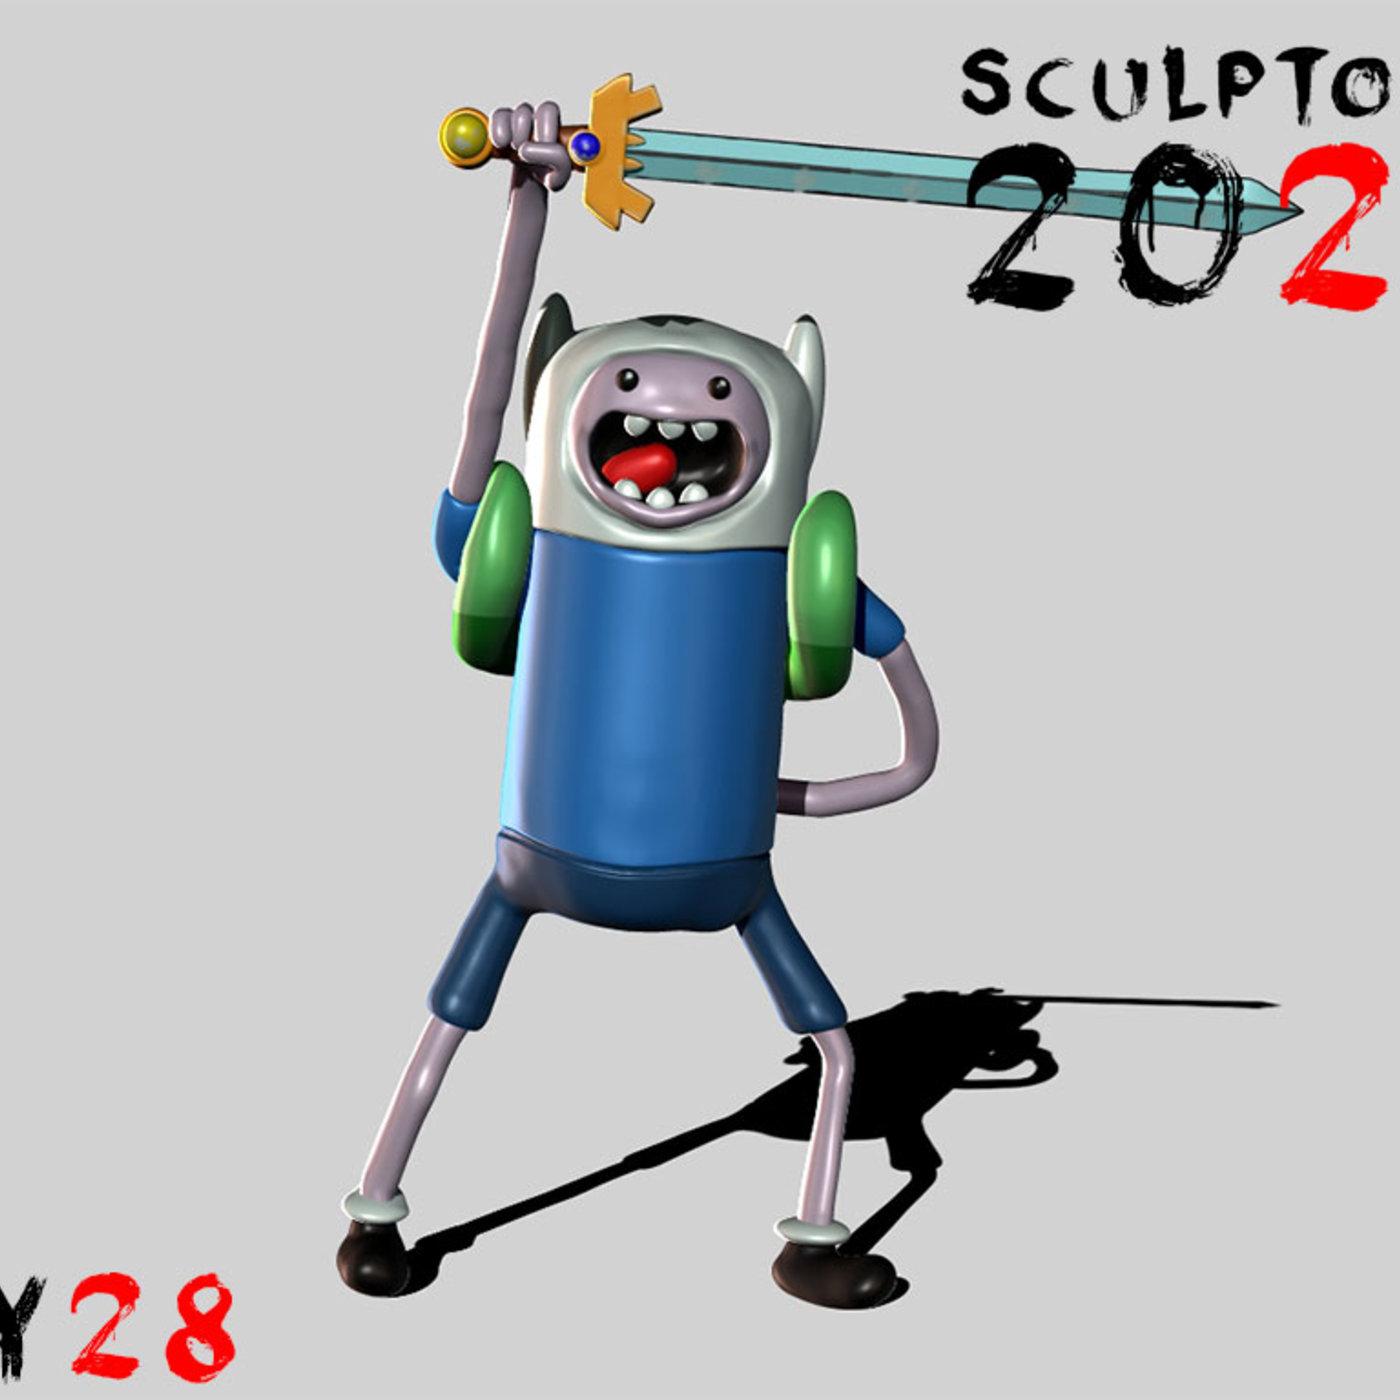 Sculptober Day 28 Adventure